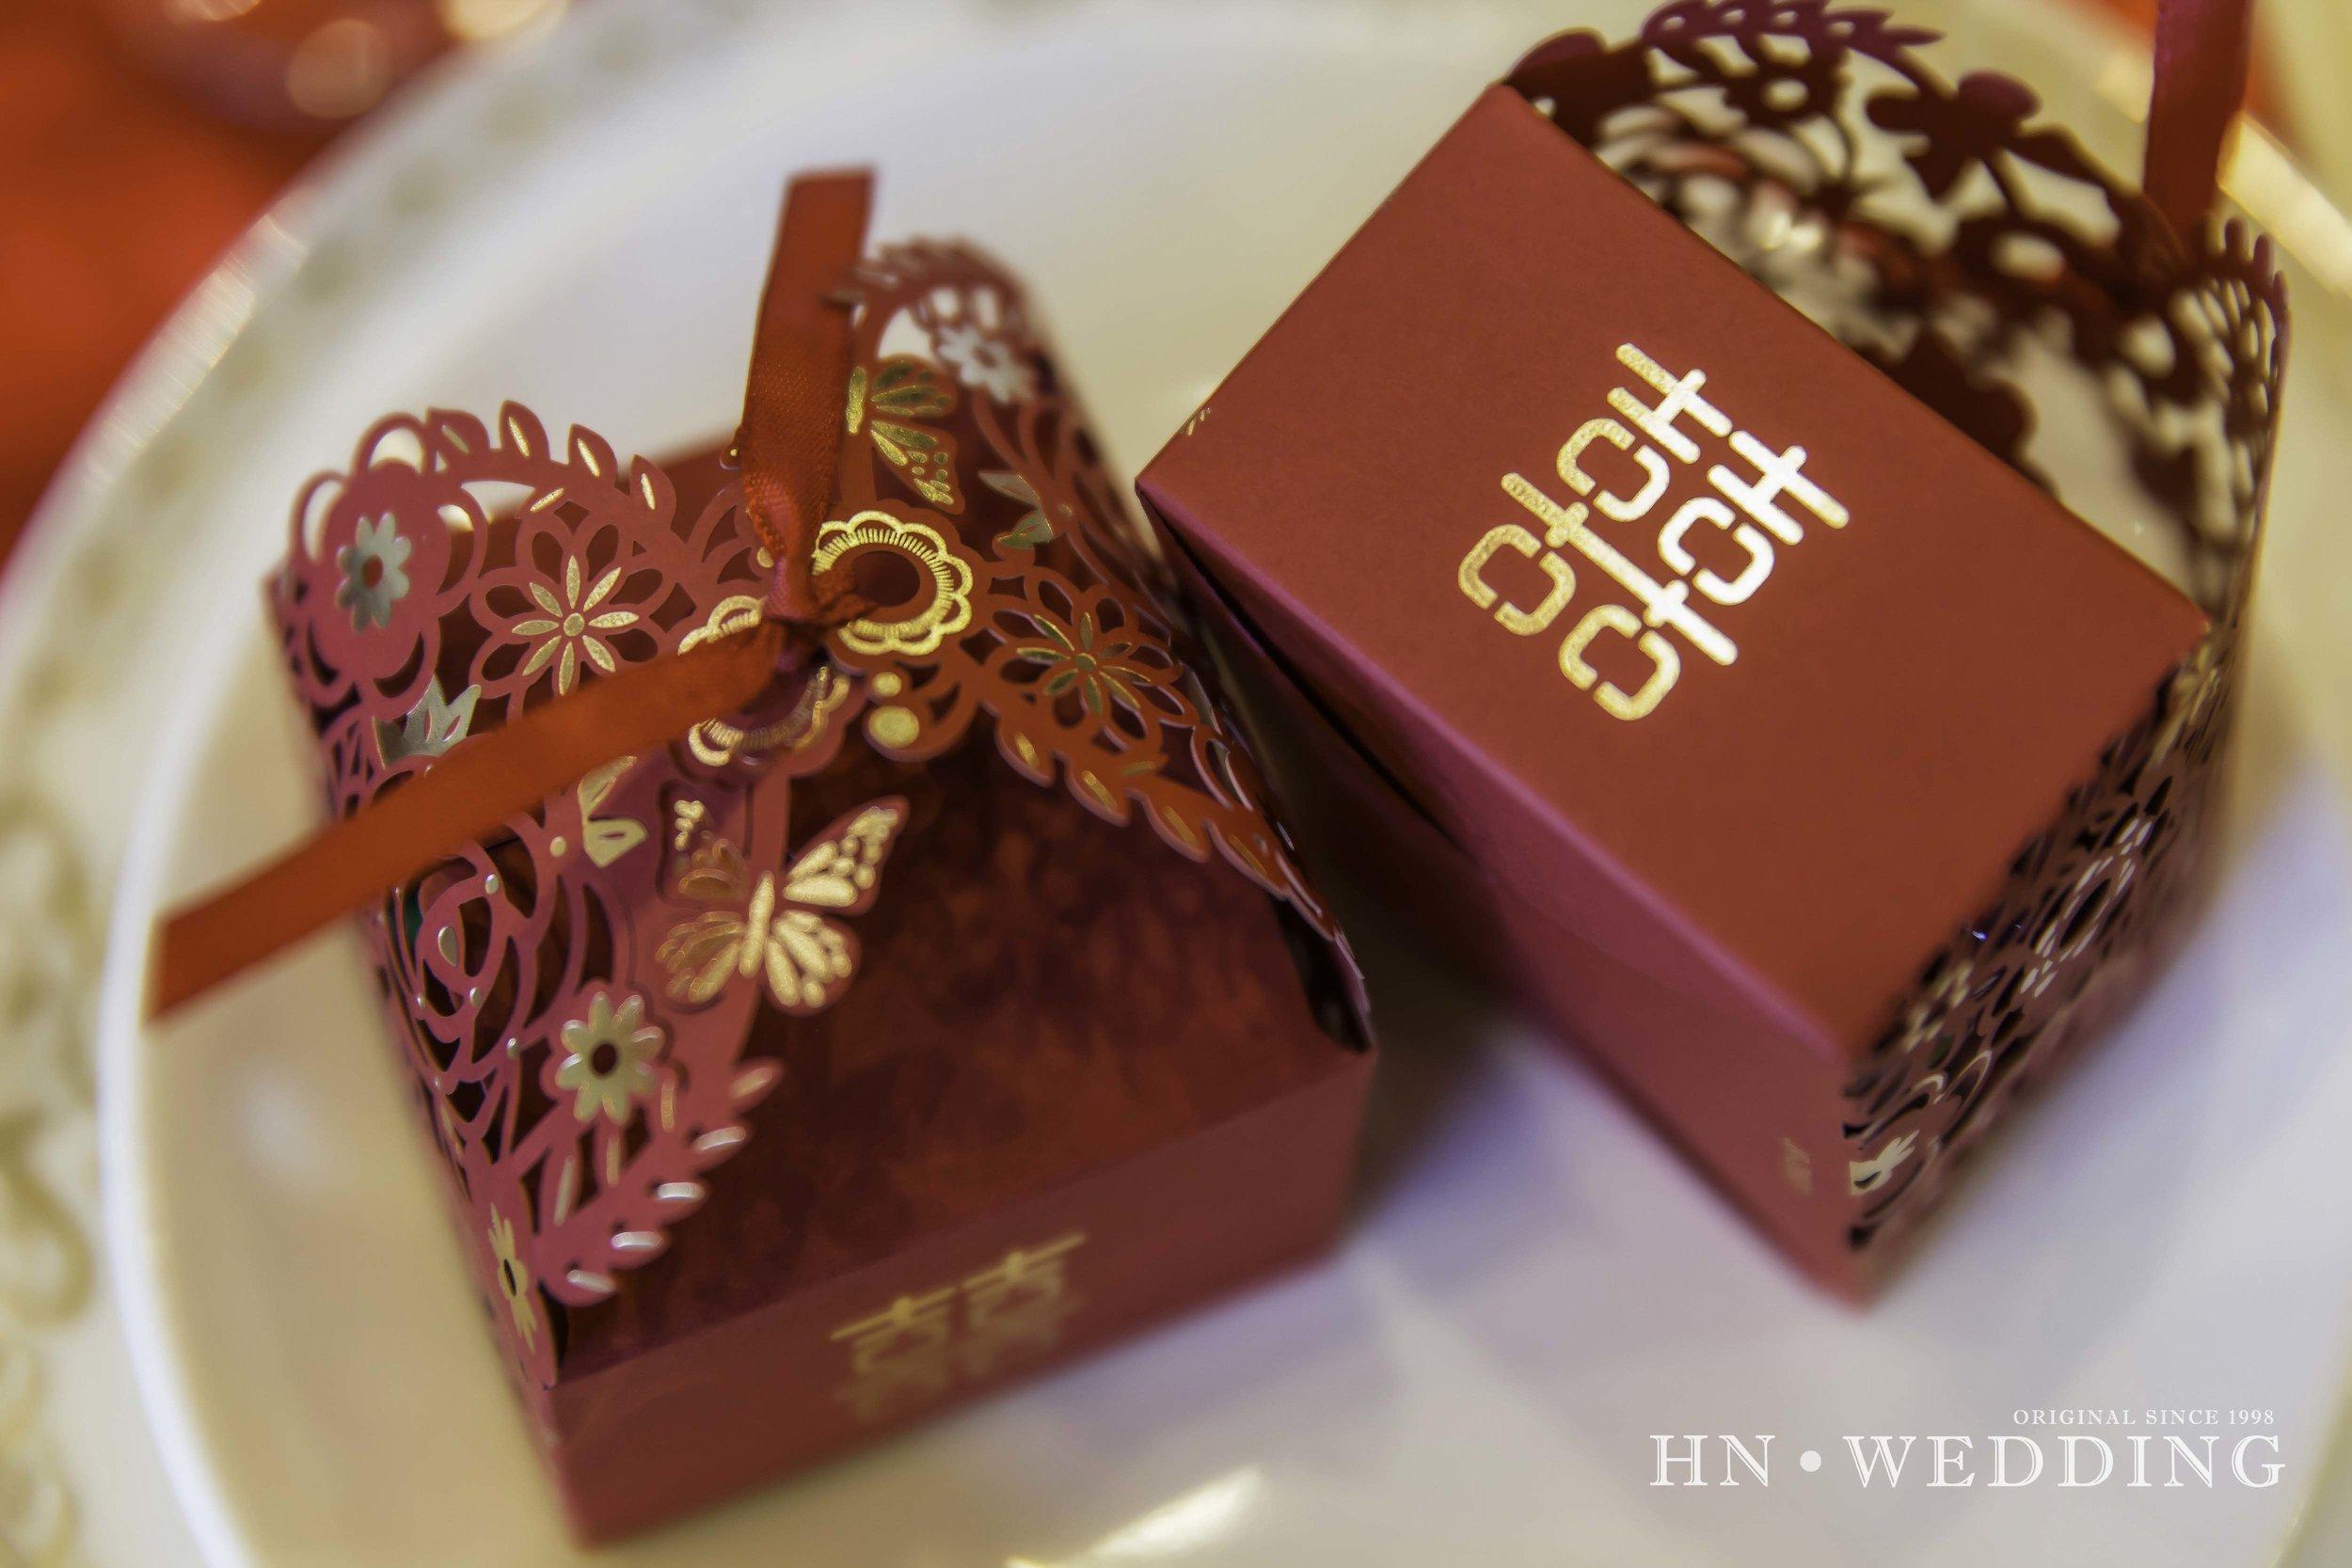 HNwedding-20160815-wedding-034.jpg